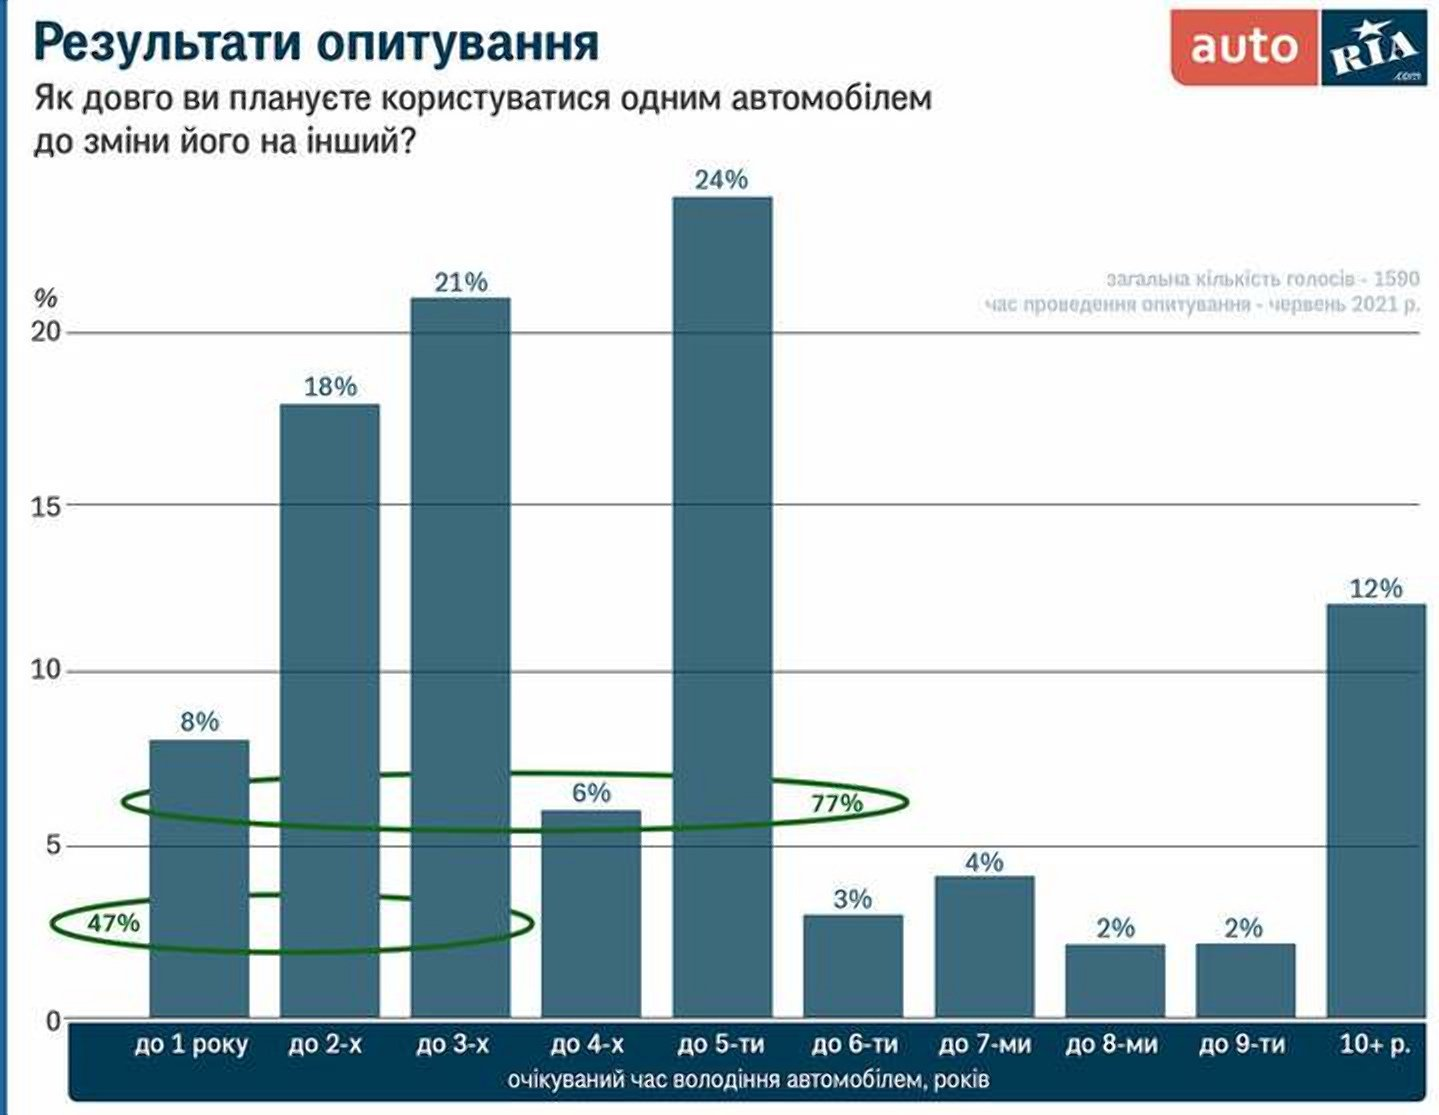 Как часто украинцы готовы менять авто, - опрос